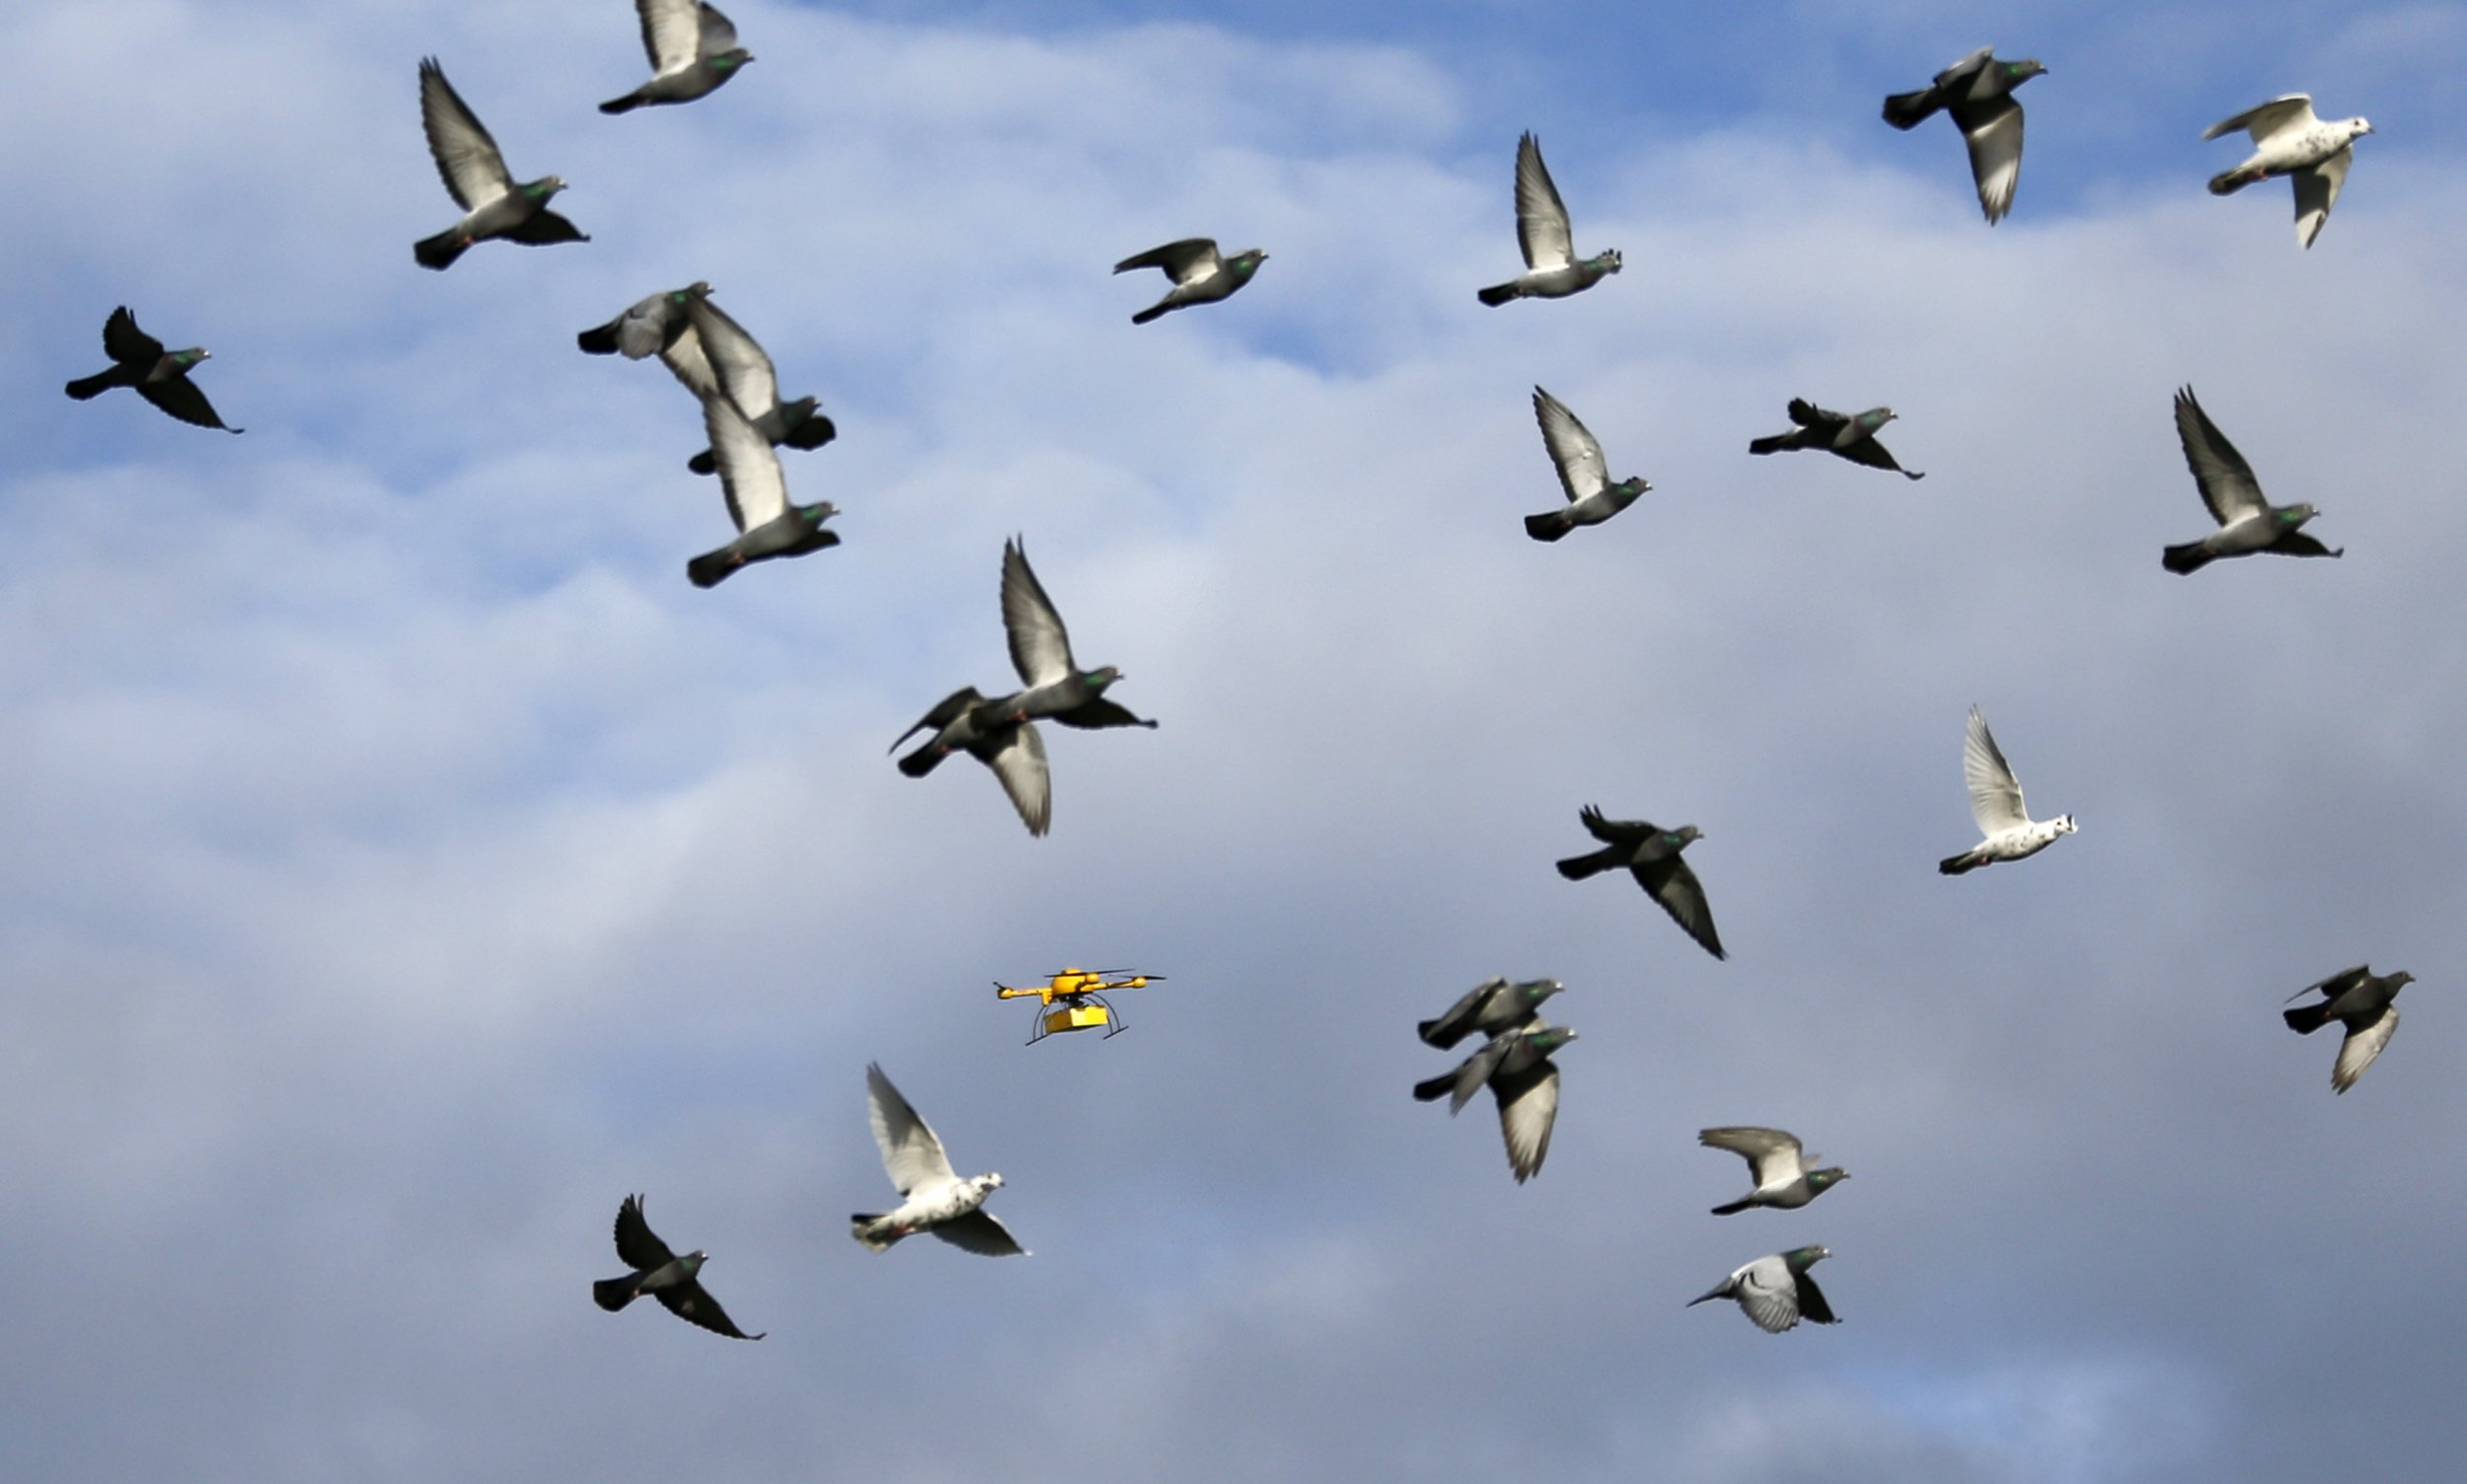 Birds and drones